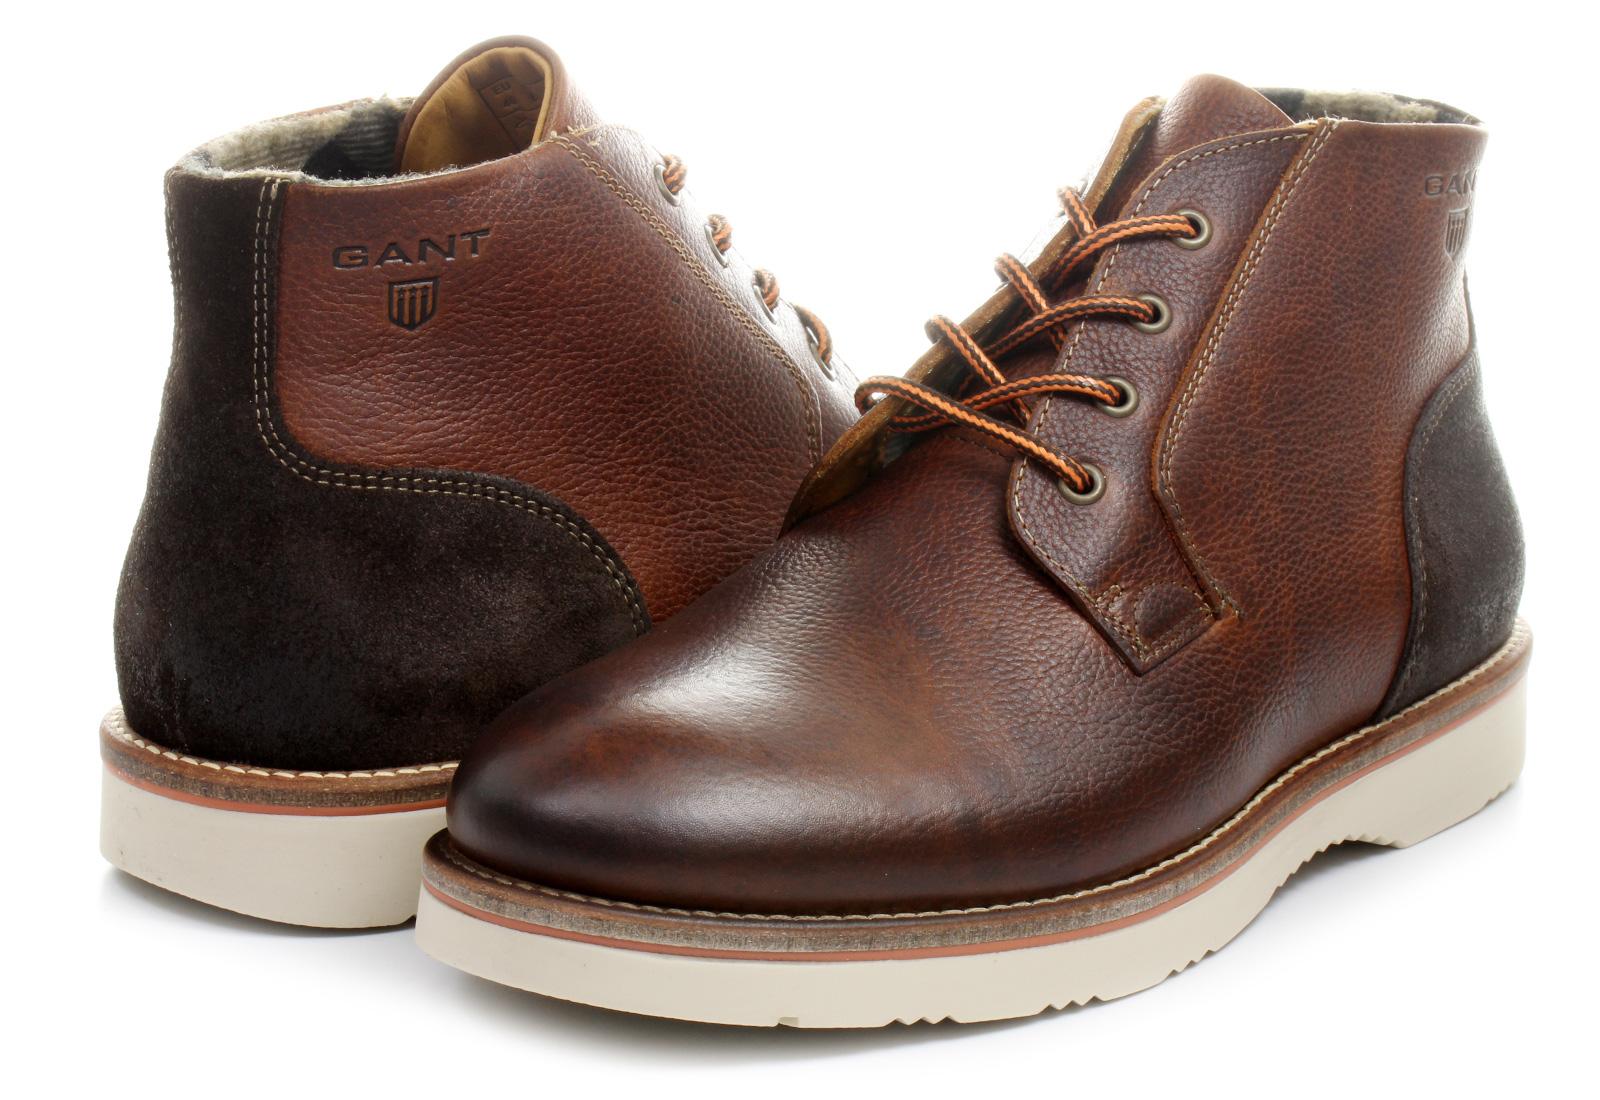 Gant Boots - Huck - 11641886-G45 - Online shop for ...